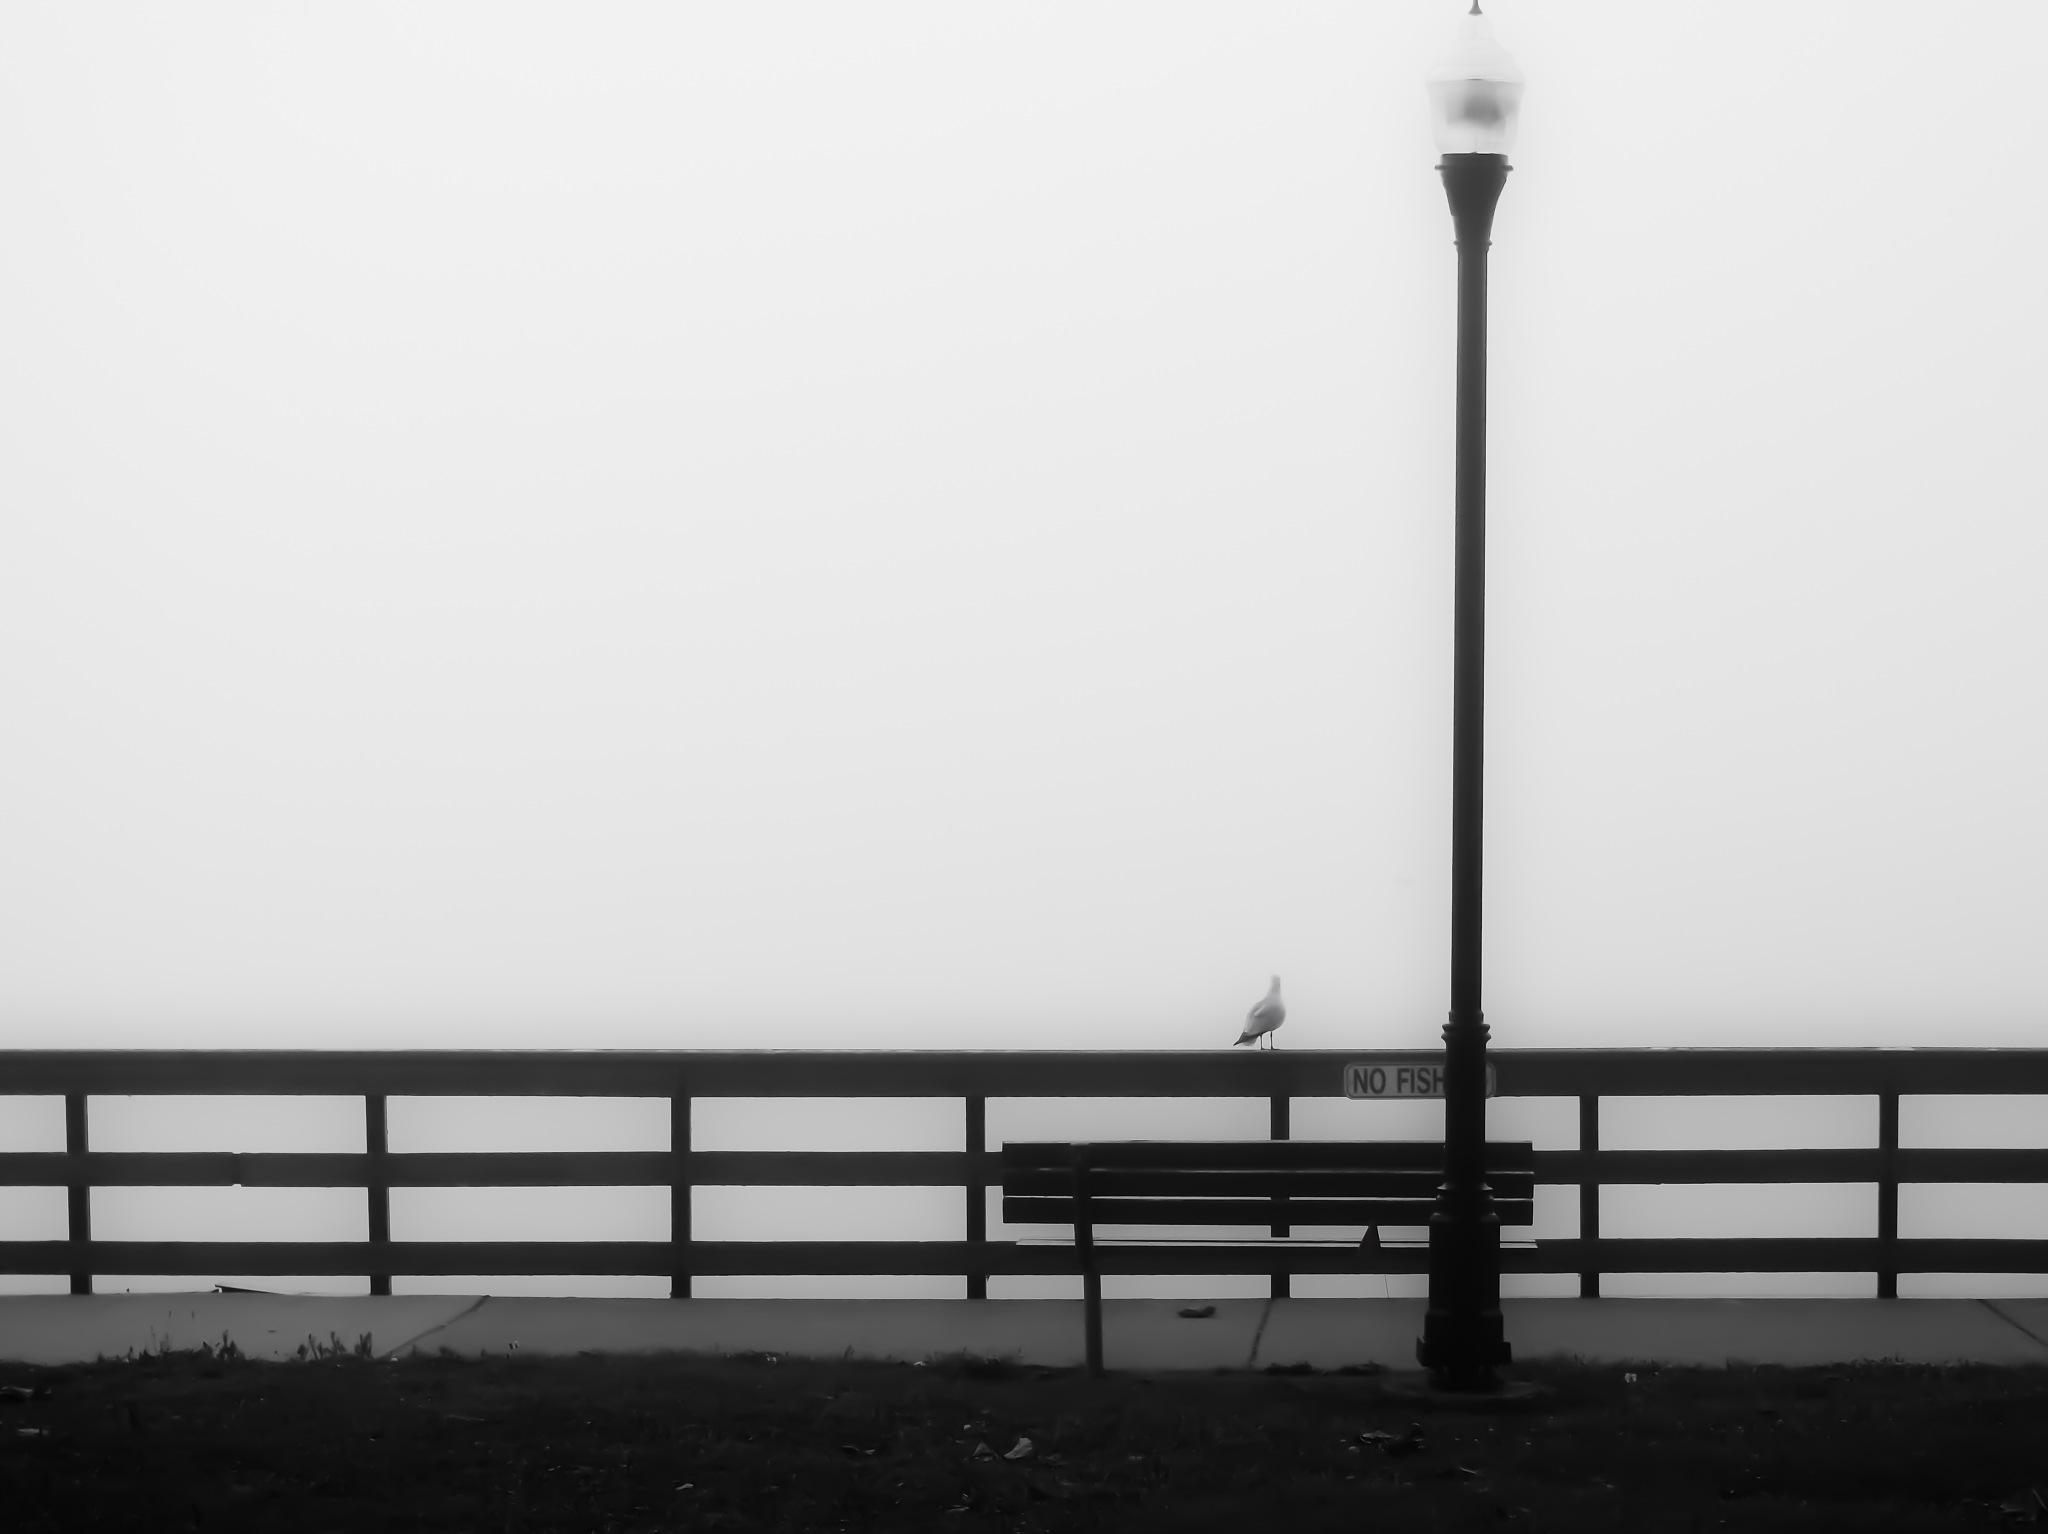 The Seagull by chuckhildebrandt7